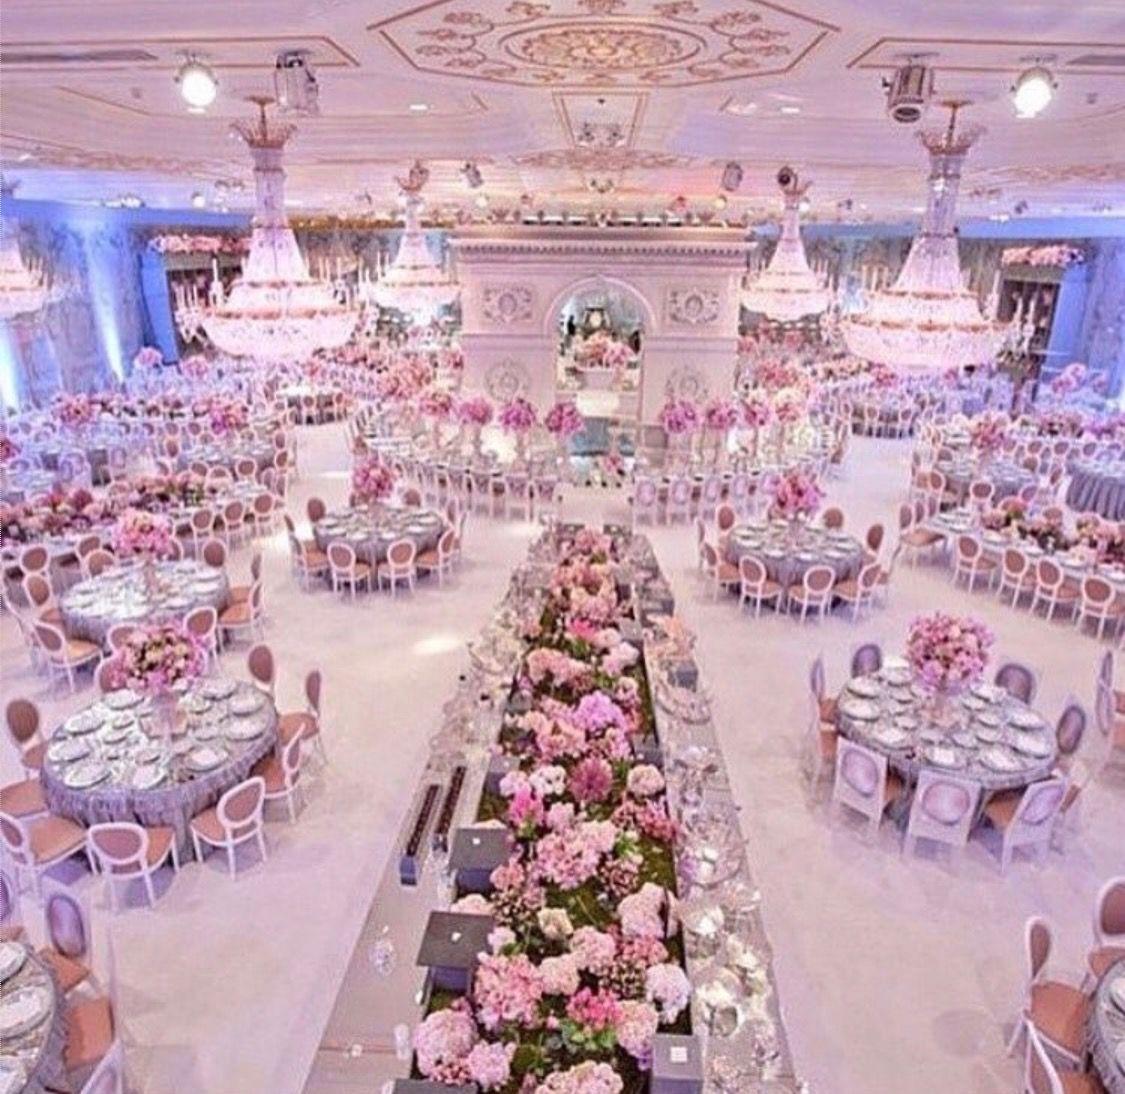 Wedding Ceremony Decorations Ideas Indoor: Paris Theme Wedding By Frances Serrano On Weddings